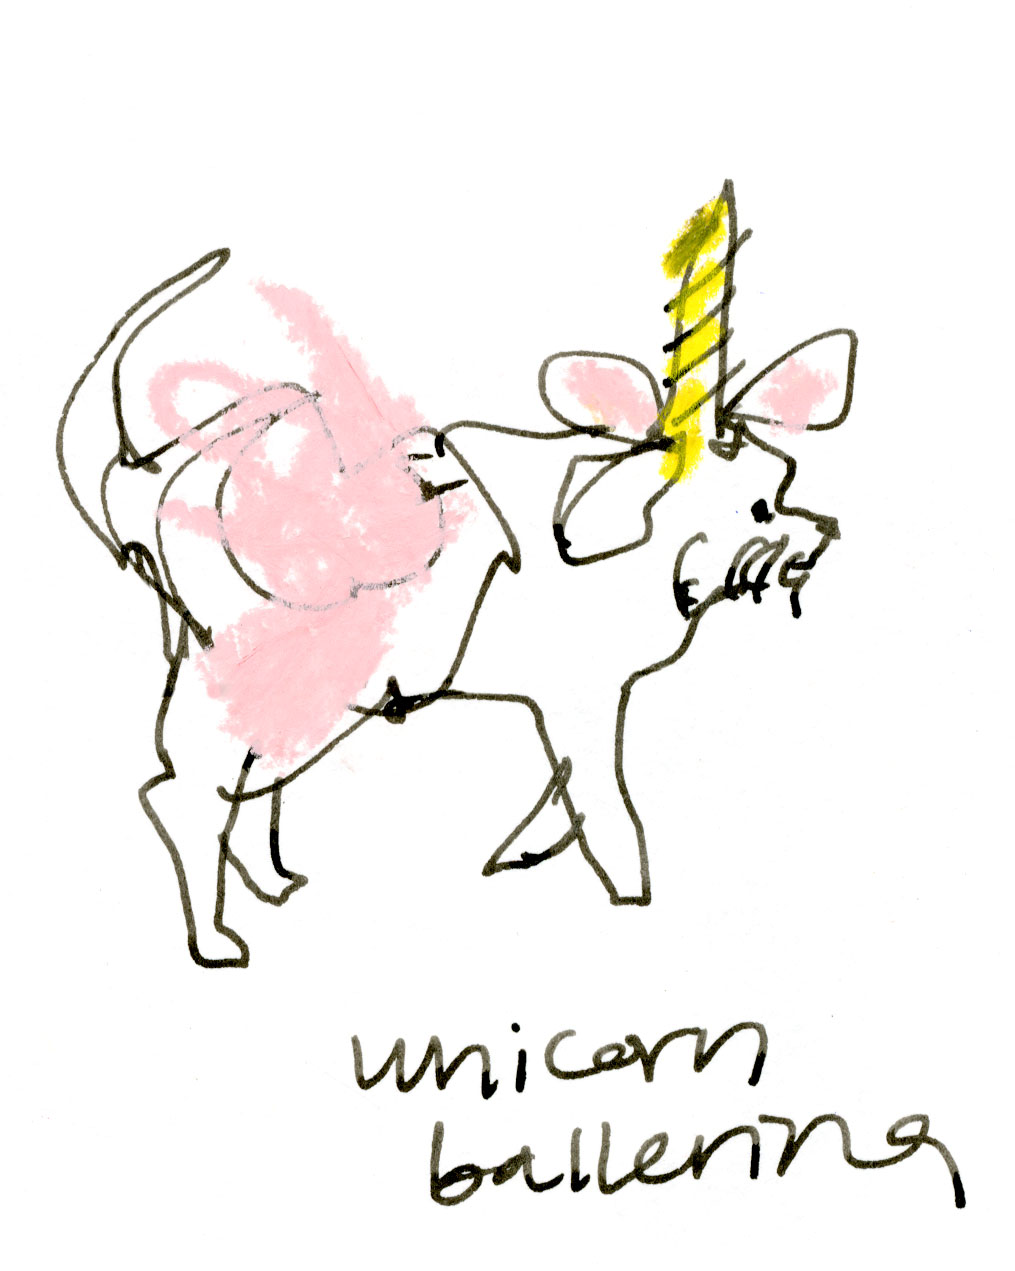 Unicorn ballerina dog © Carly Larsson 2014